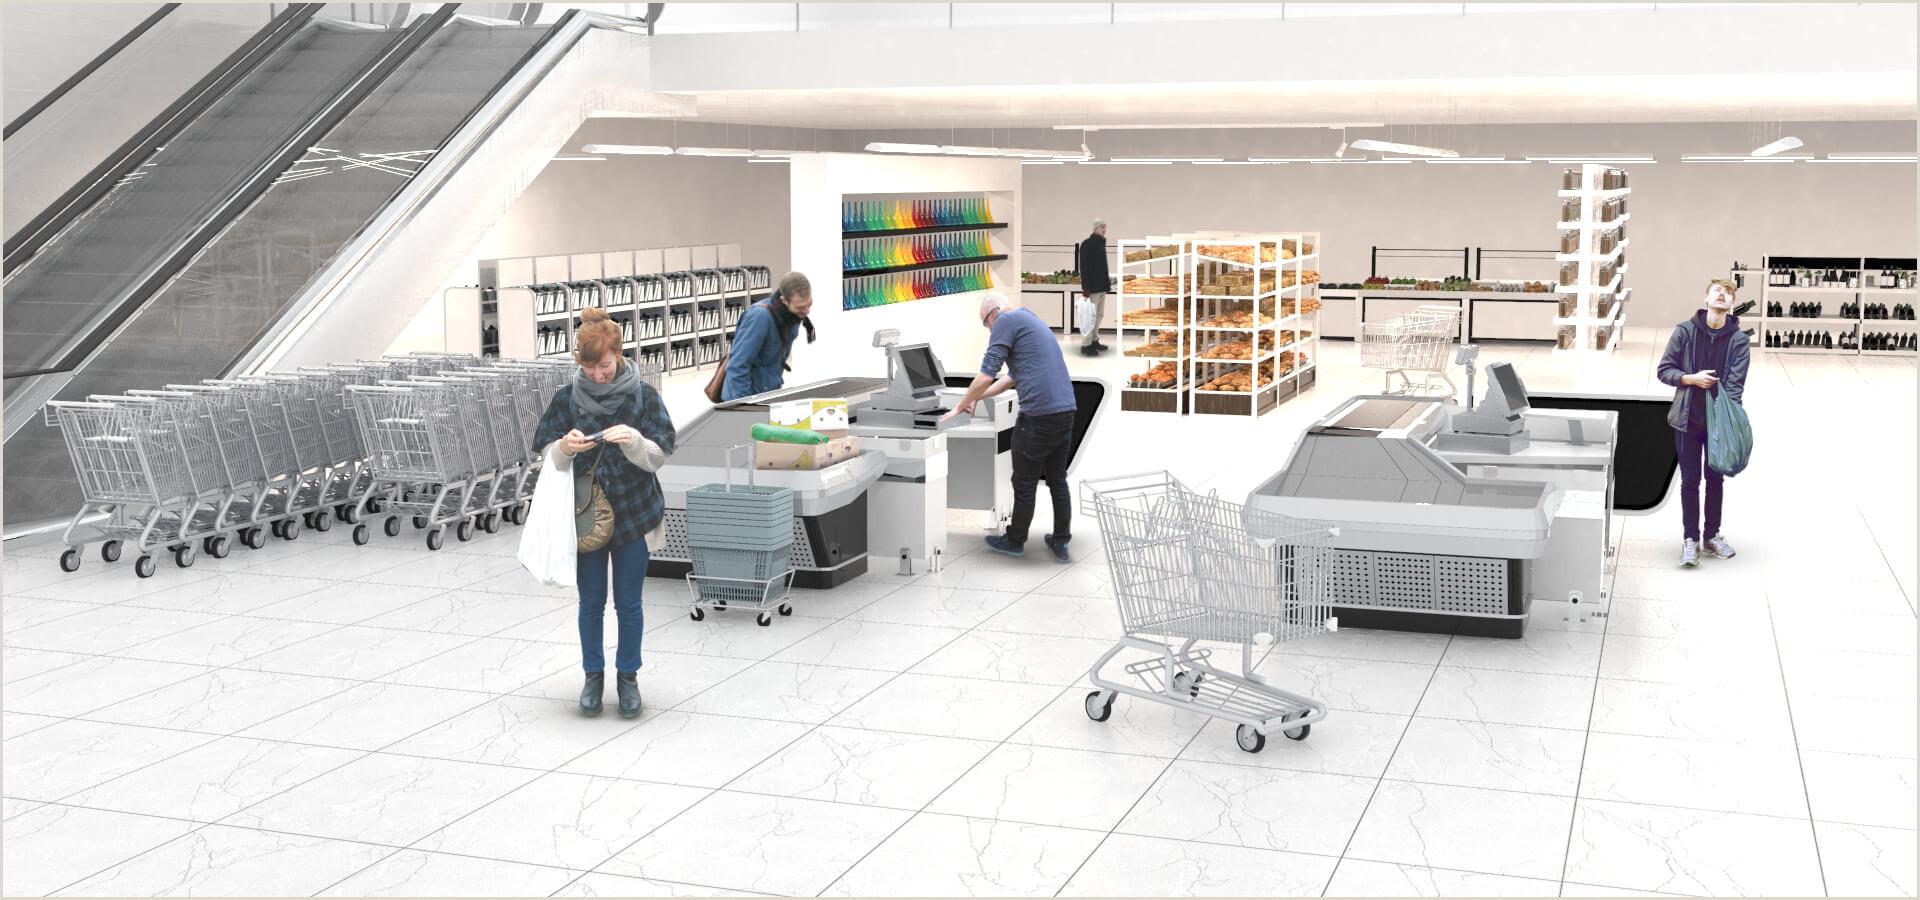 Descargar Hoja De Vida Actualizada Sistema De Iluminaci³n Lineal Od 5950 Led Para Supermercados